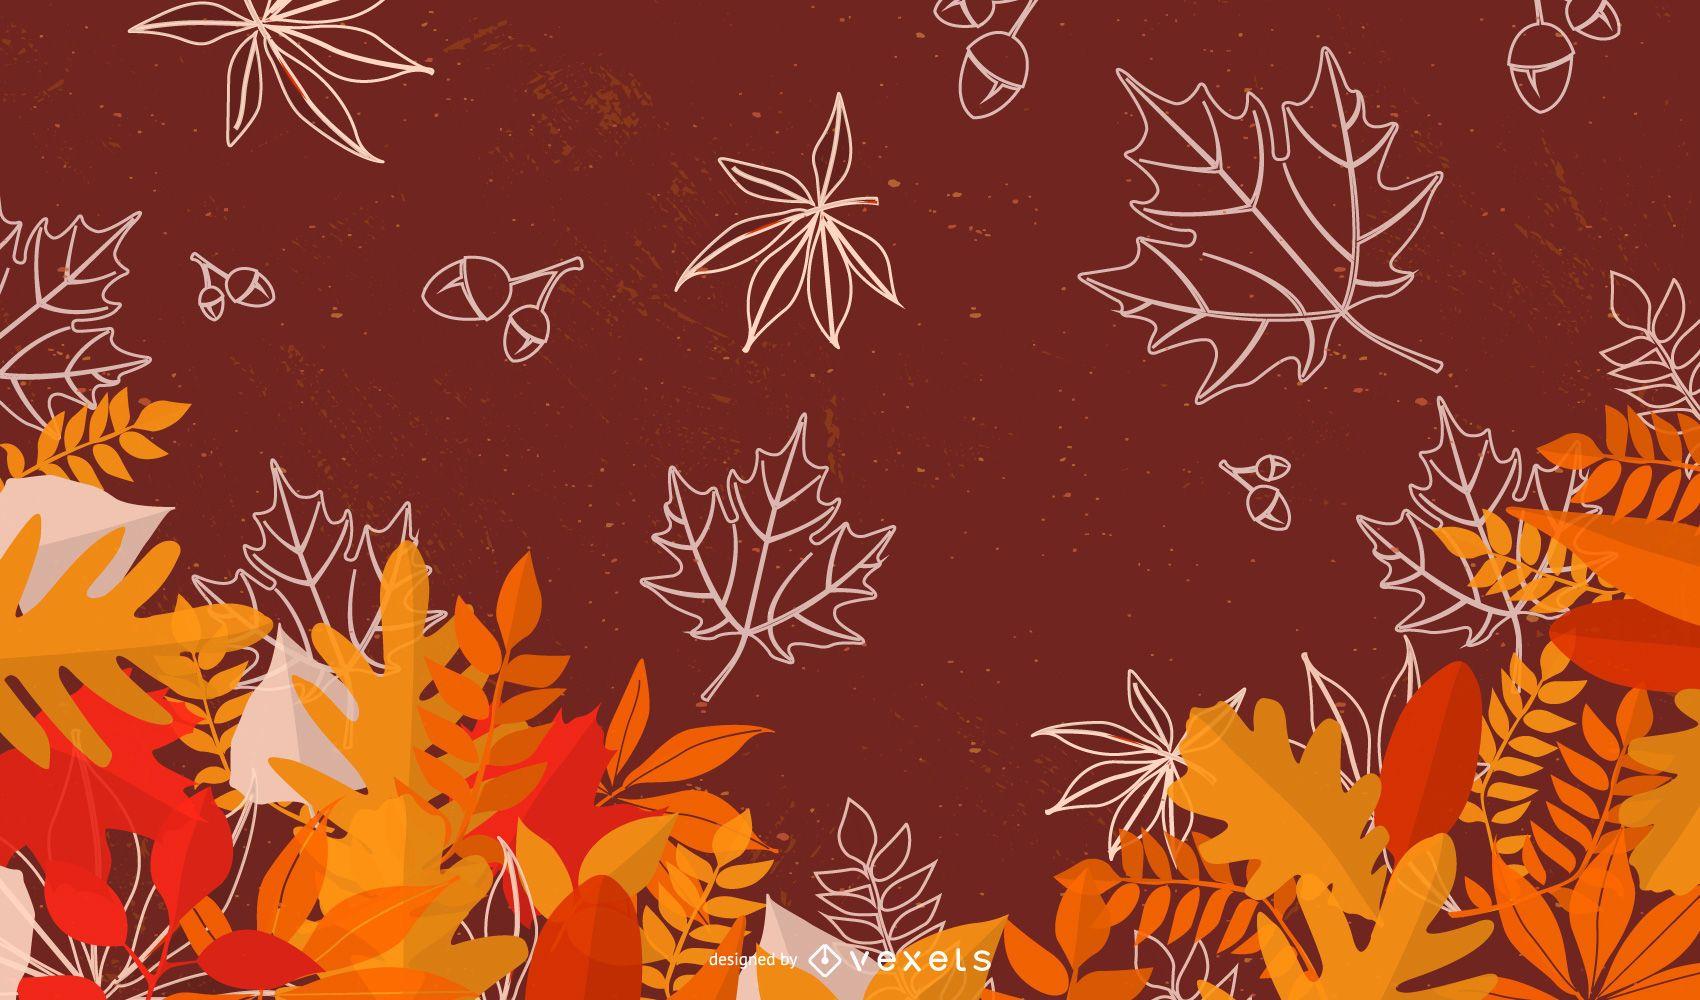 Hermoso otoño hojas de fondo estacional